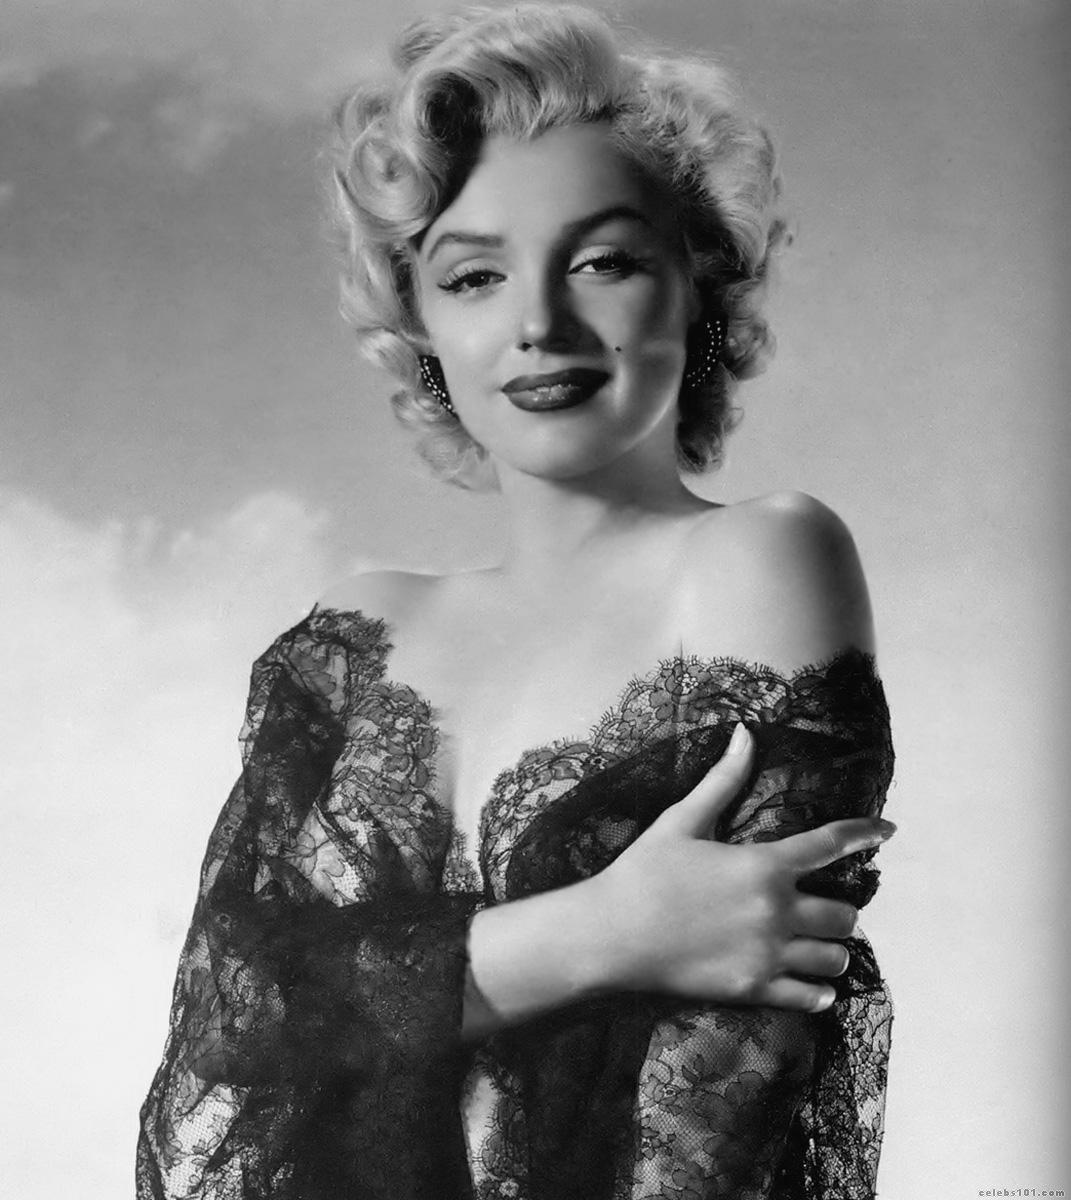 http://3.bp.blogspot.com/-psJtoDSe-4o/TcqMD75zdCI/AAAAAAAAEm0/-YOWqt1ZAeI/s1600/Marilyn_Monroe_13.jpg